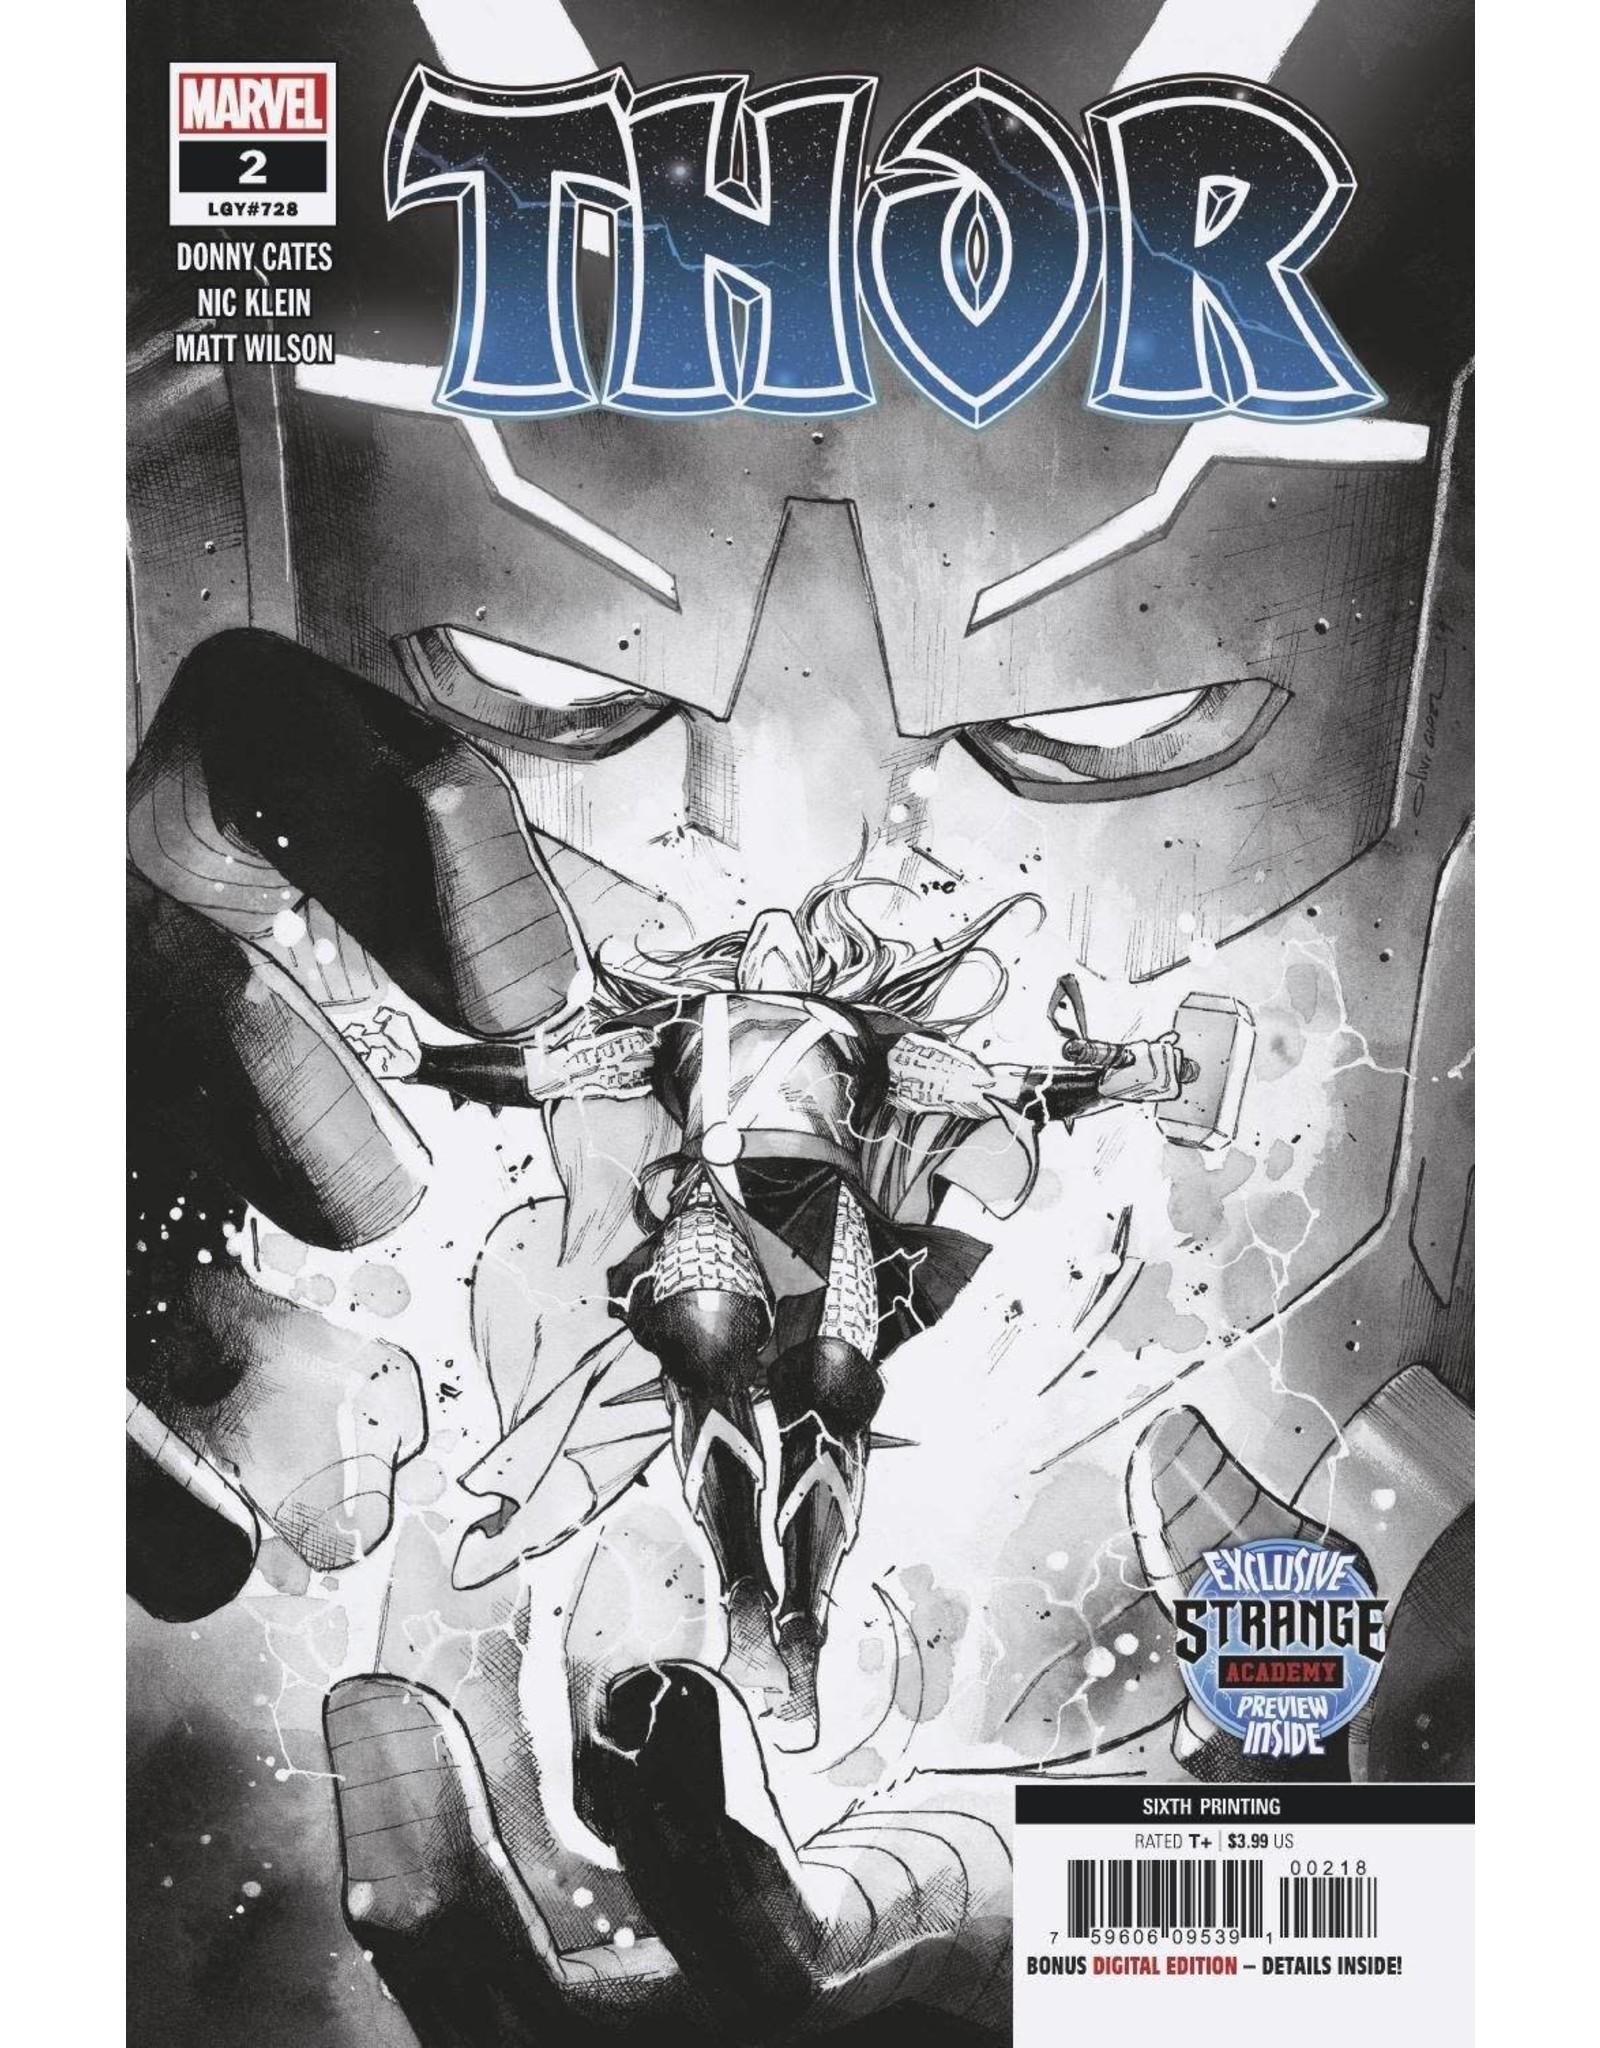 Marvel Comics THOR #2 6TH PTG COIPEL VAR